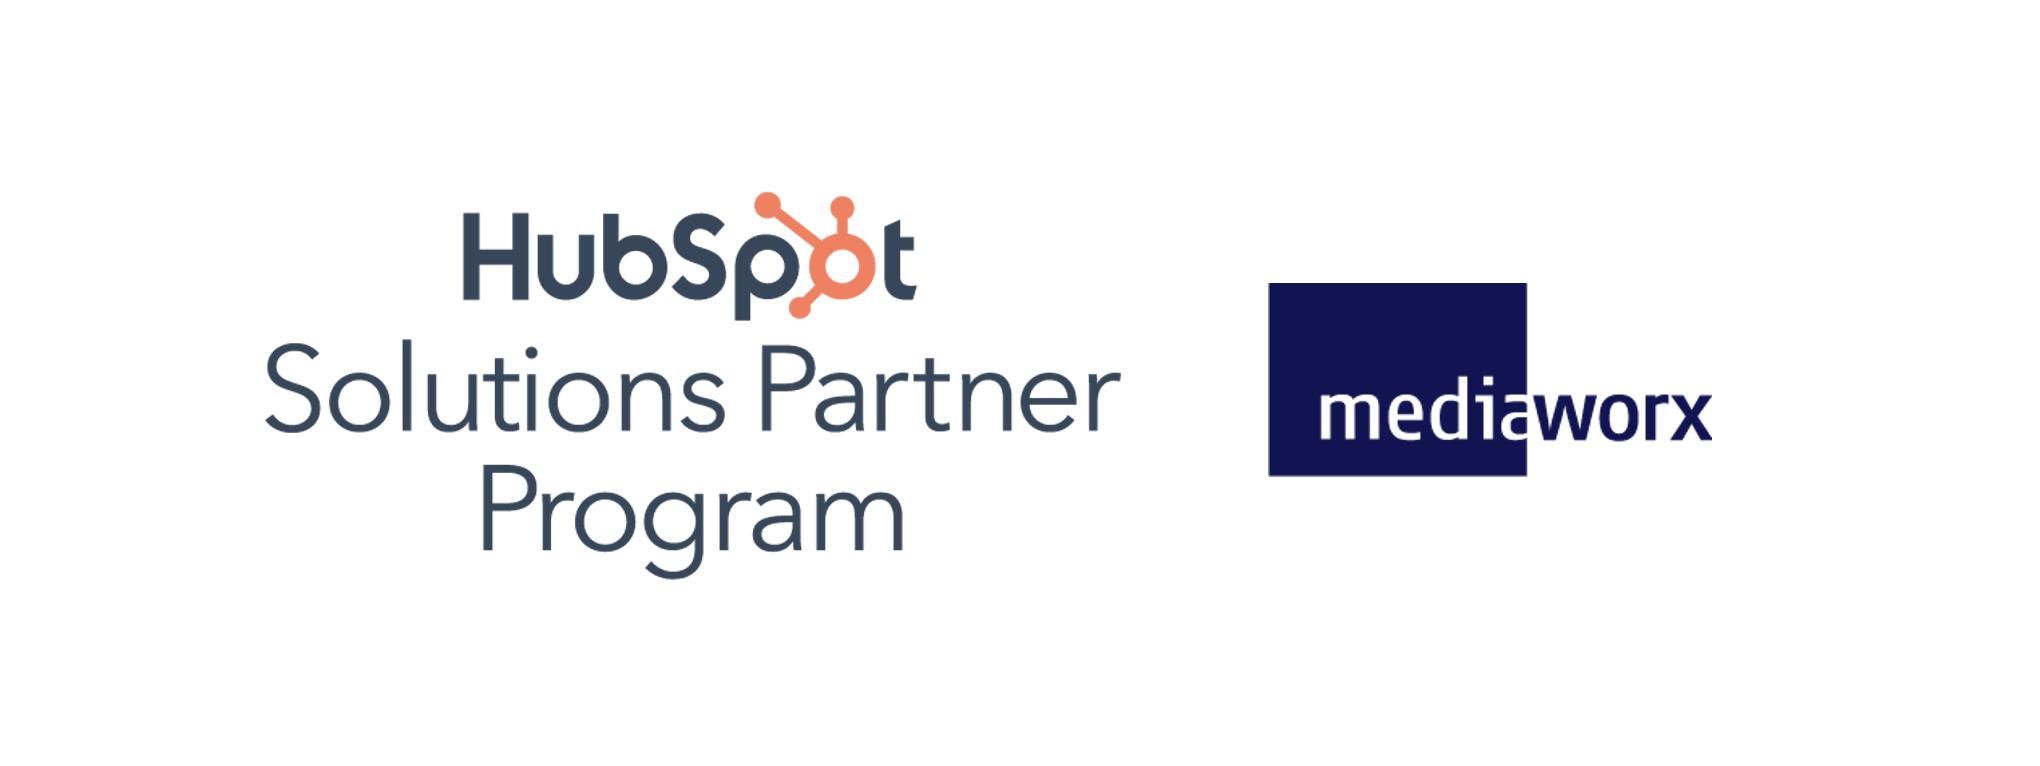 mediaworx HubSpot Partner Advisory Council 2021